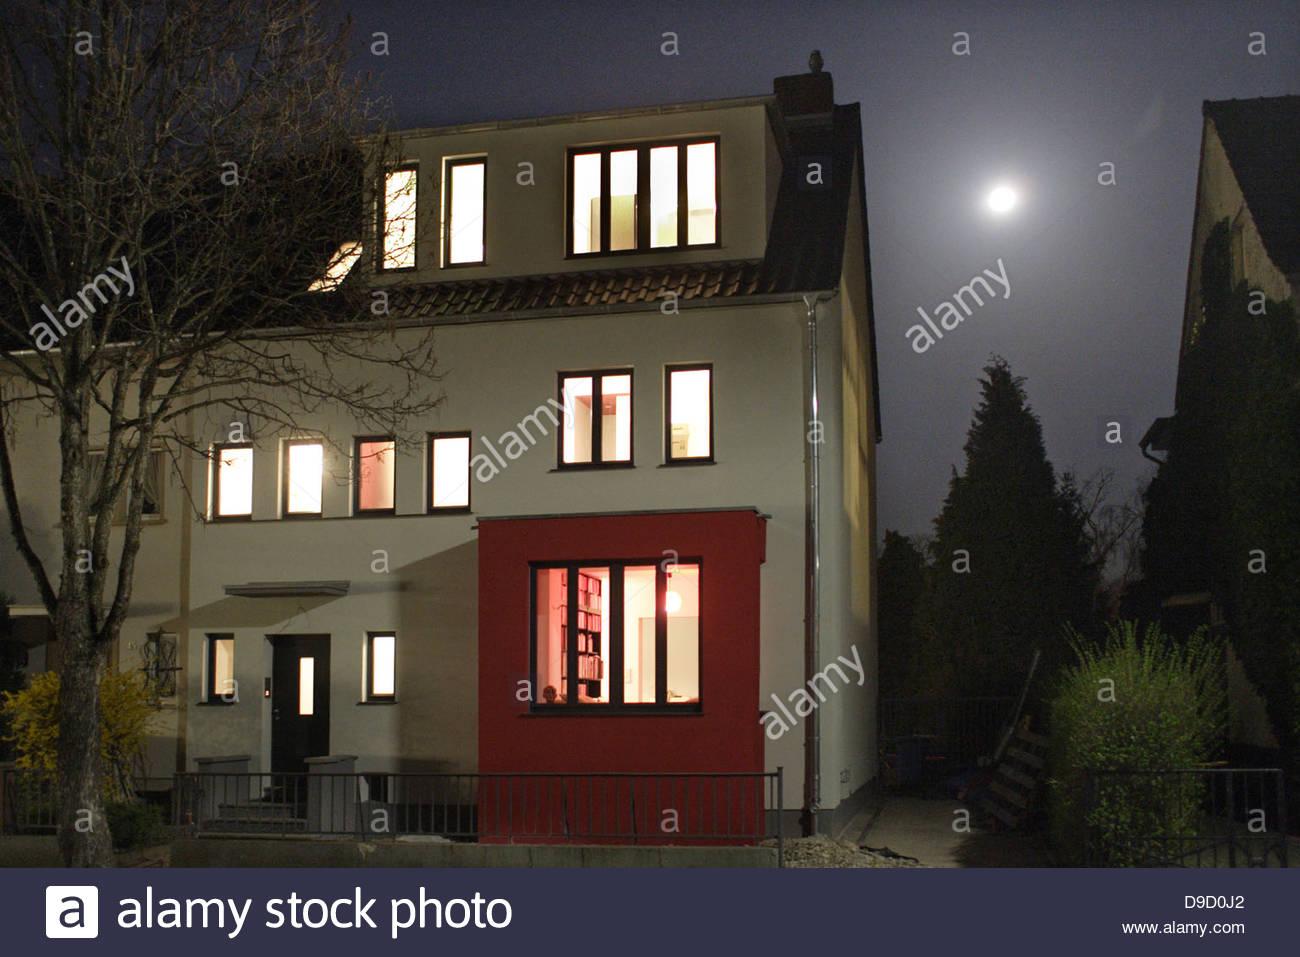 Casa illuminata di notte, Bonn, Germania Foto Stock